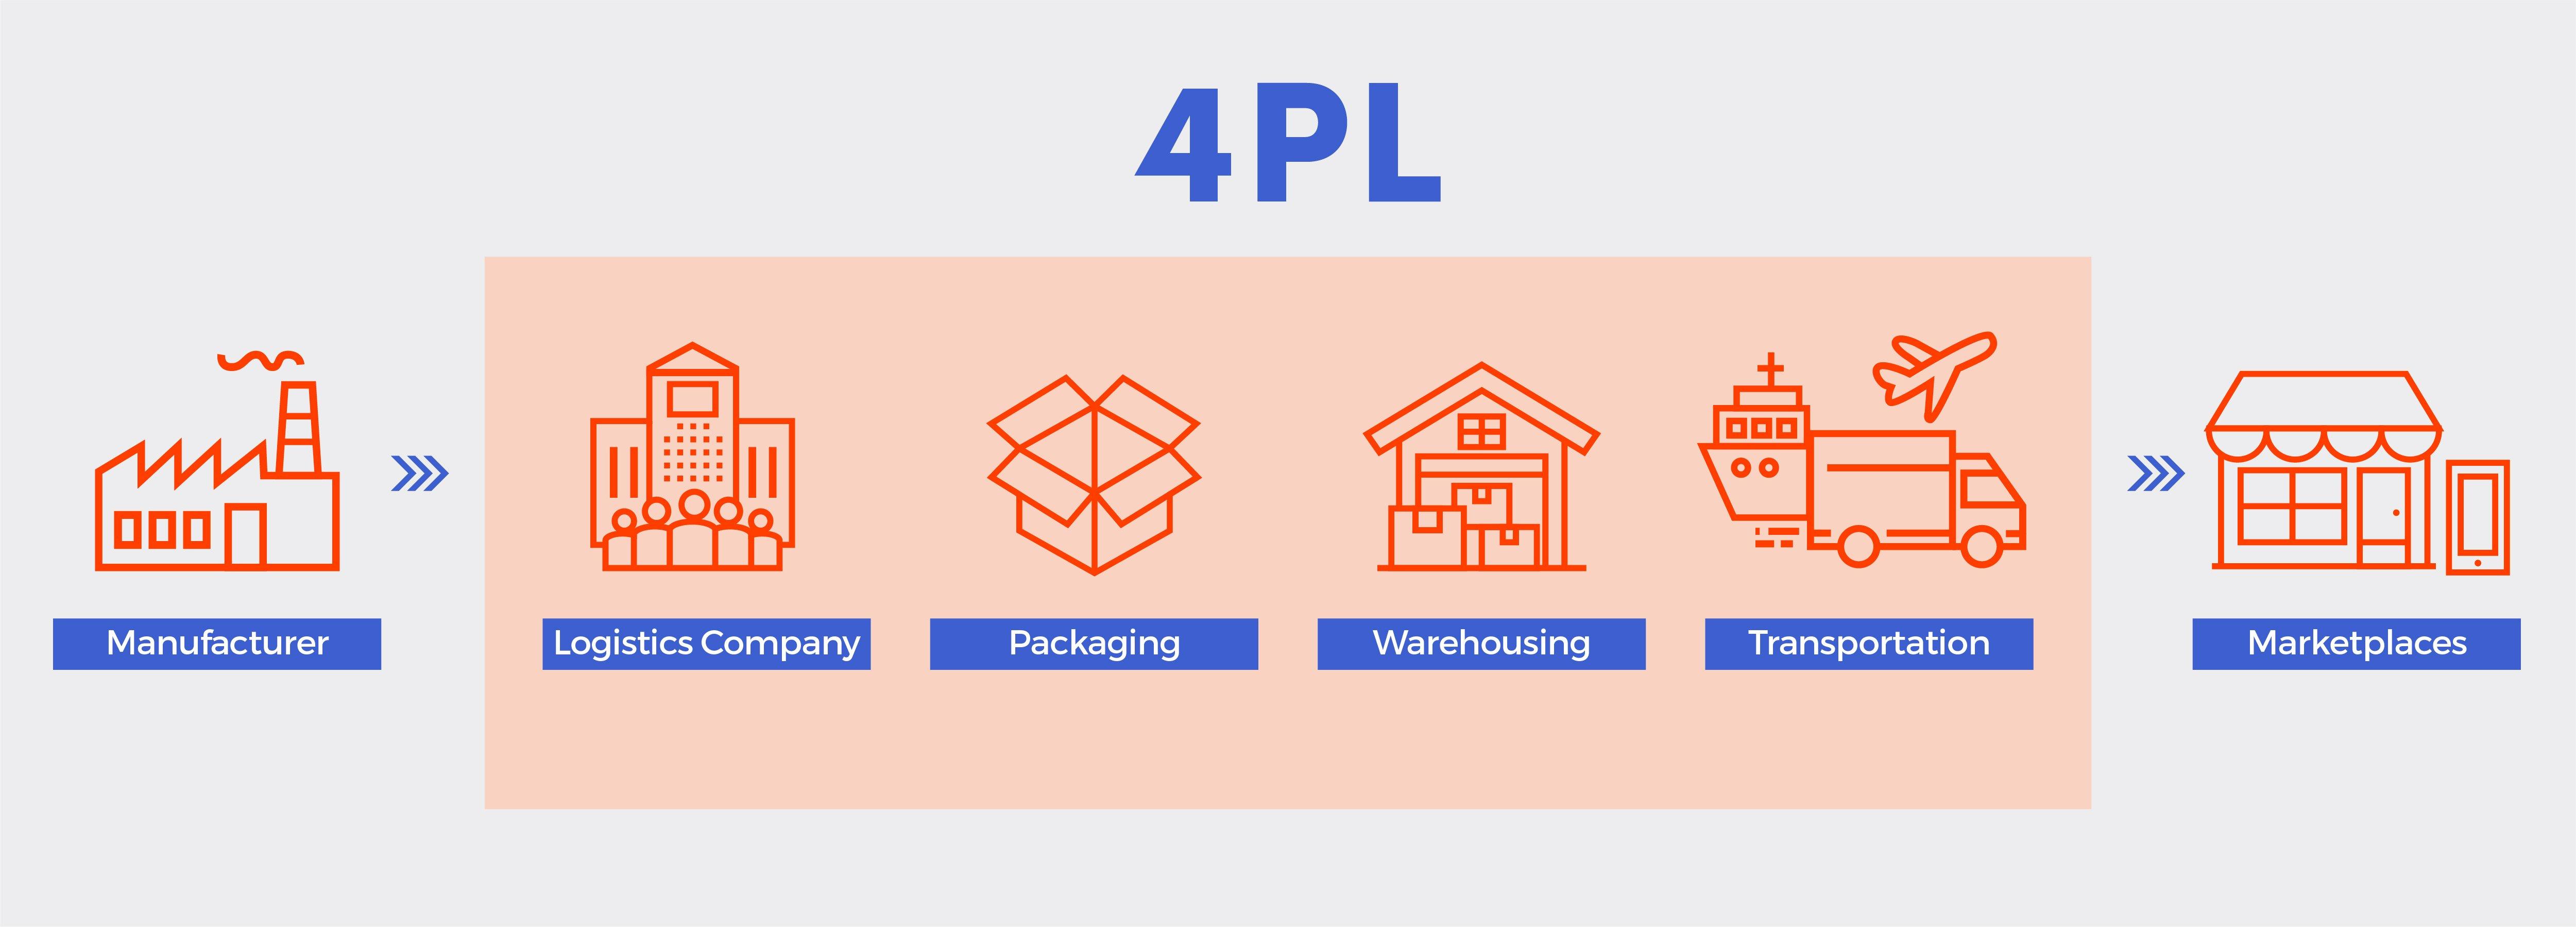 A 4PL Supply Chain Flowchart